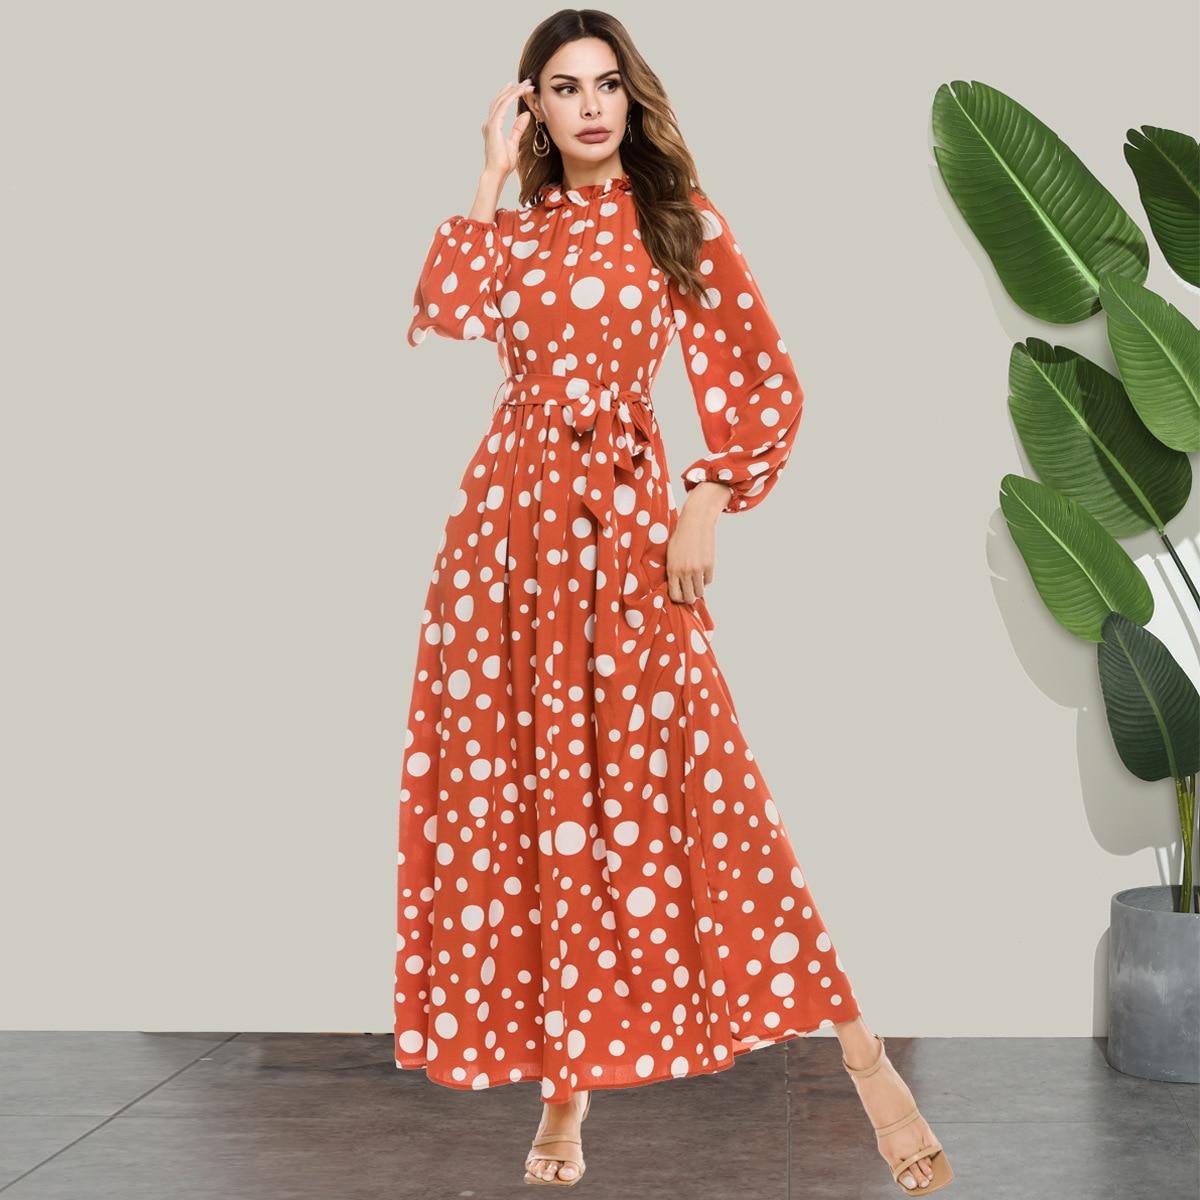 Moroccan Kaftan Muslim Women Dress Long Sleeve Pa-line Abaya Boho Vestidos Eid Ramadan Islamic Clothing Print Plus Size Robe